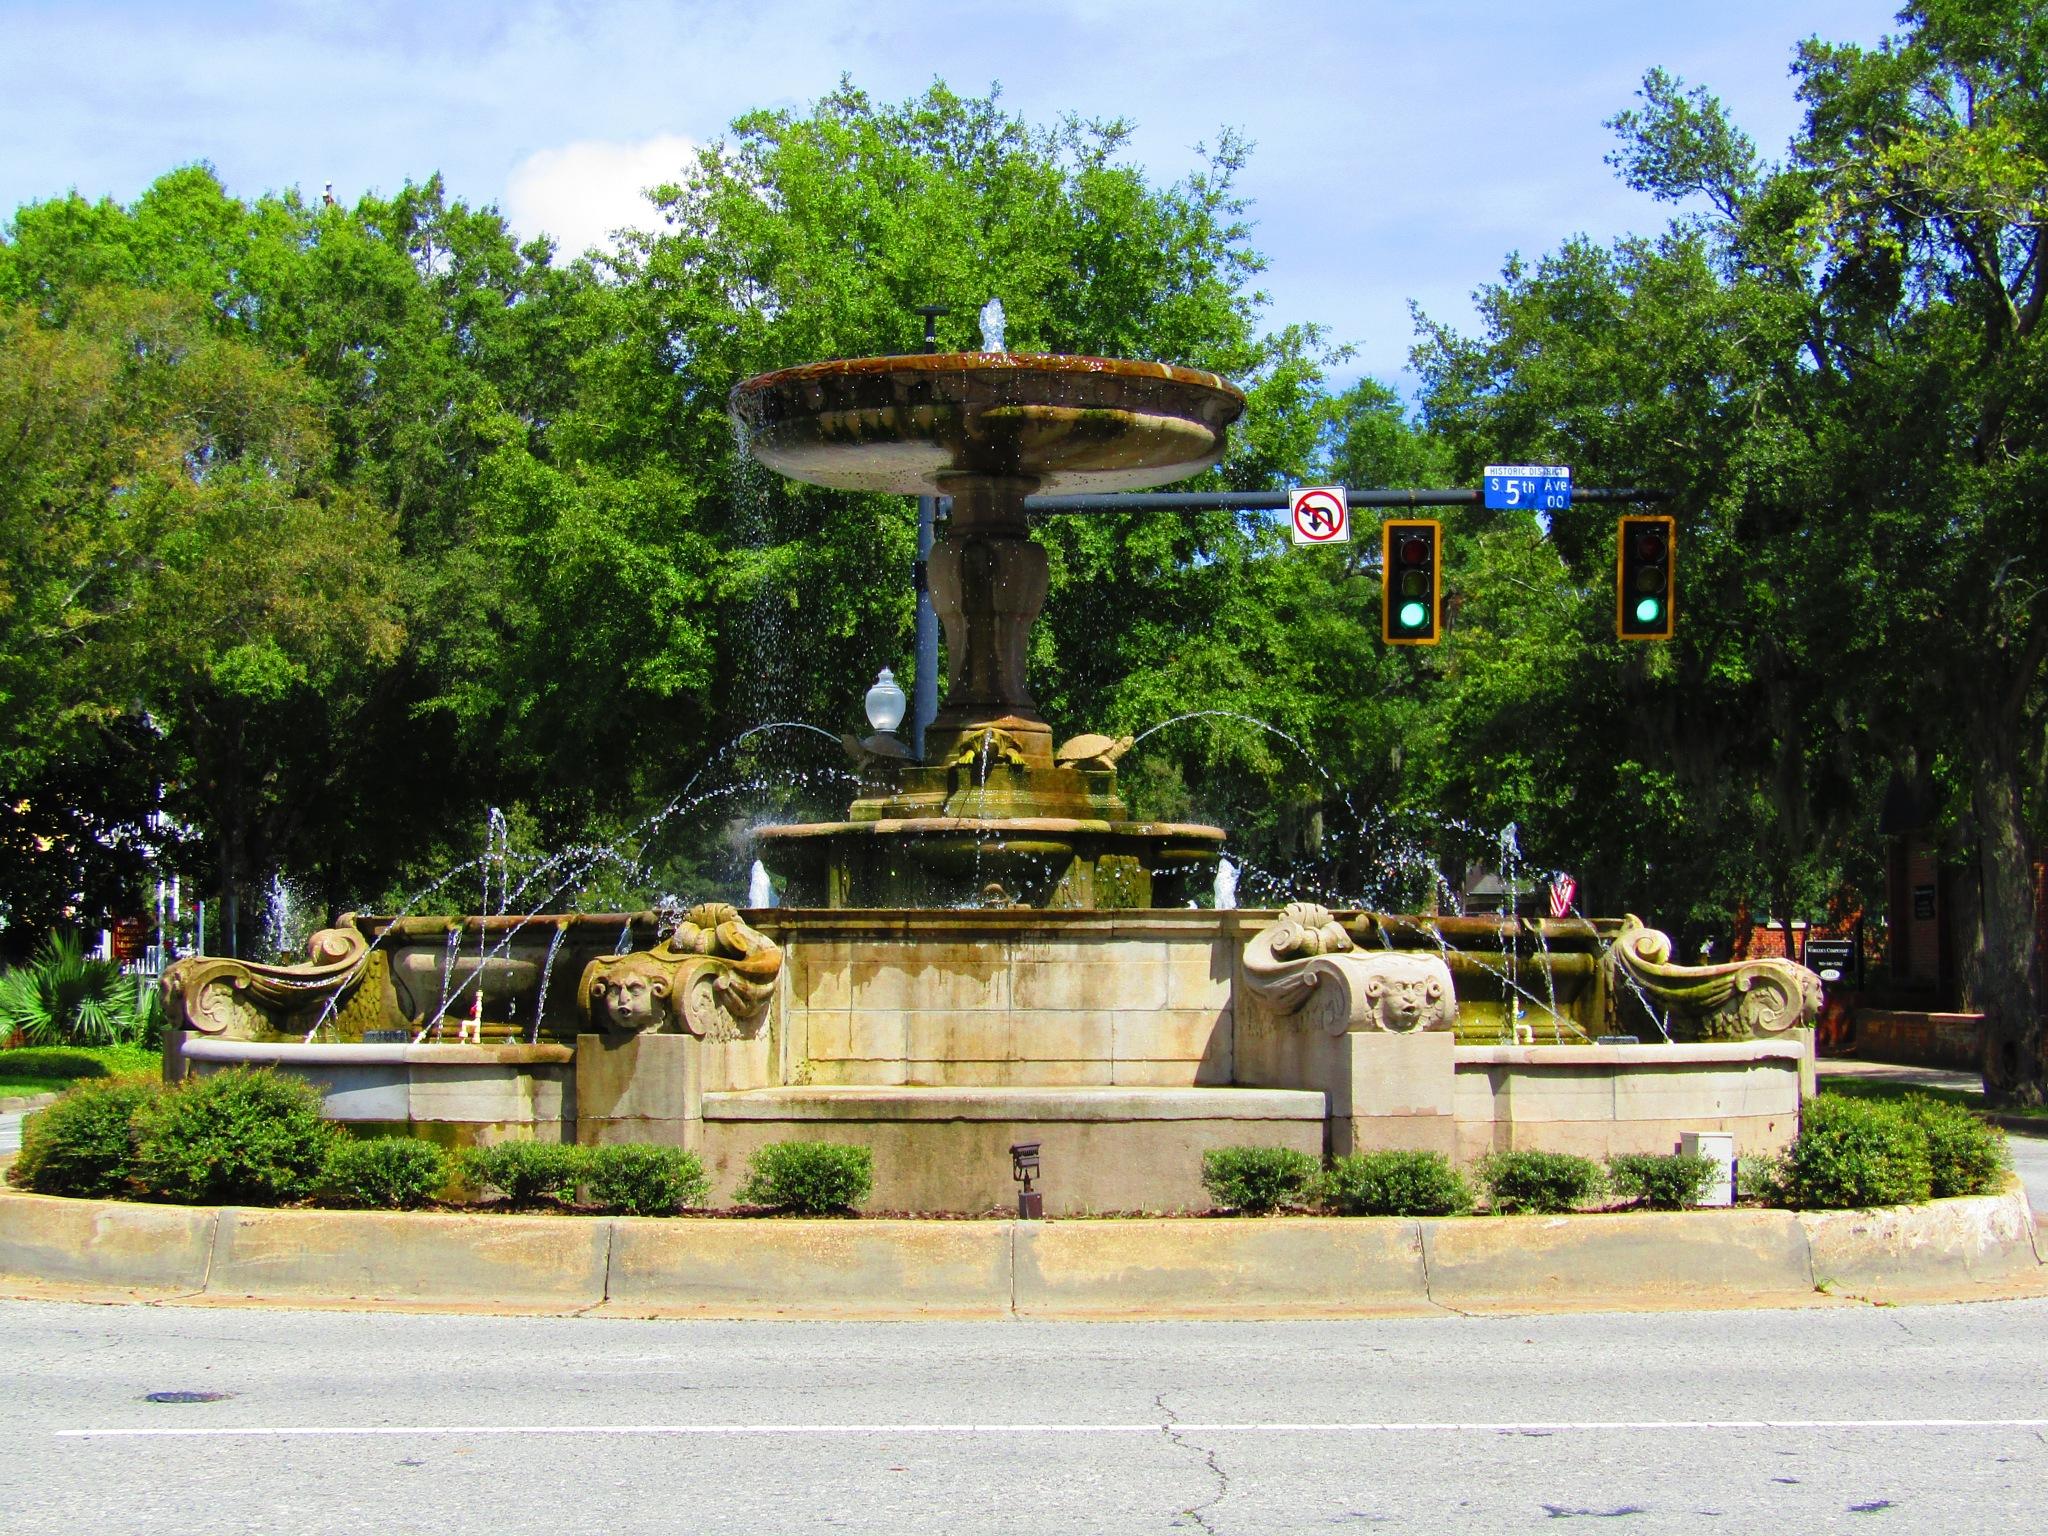 5th Ave Fountain by StevenKlabunde